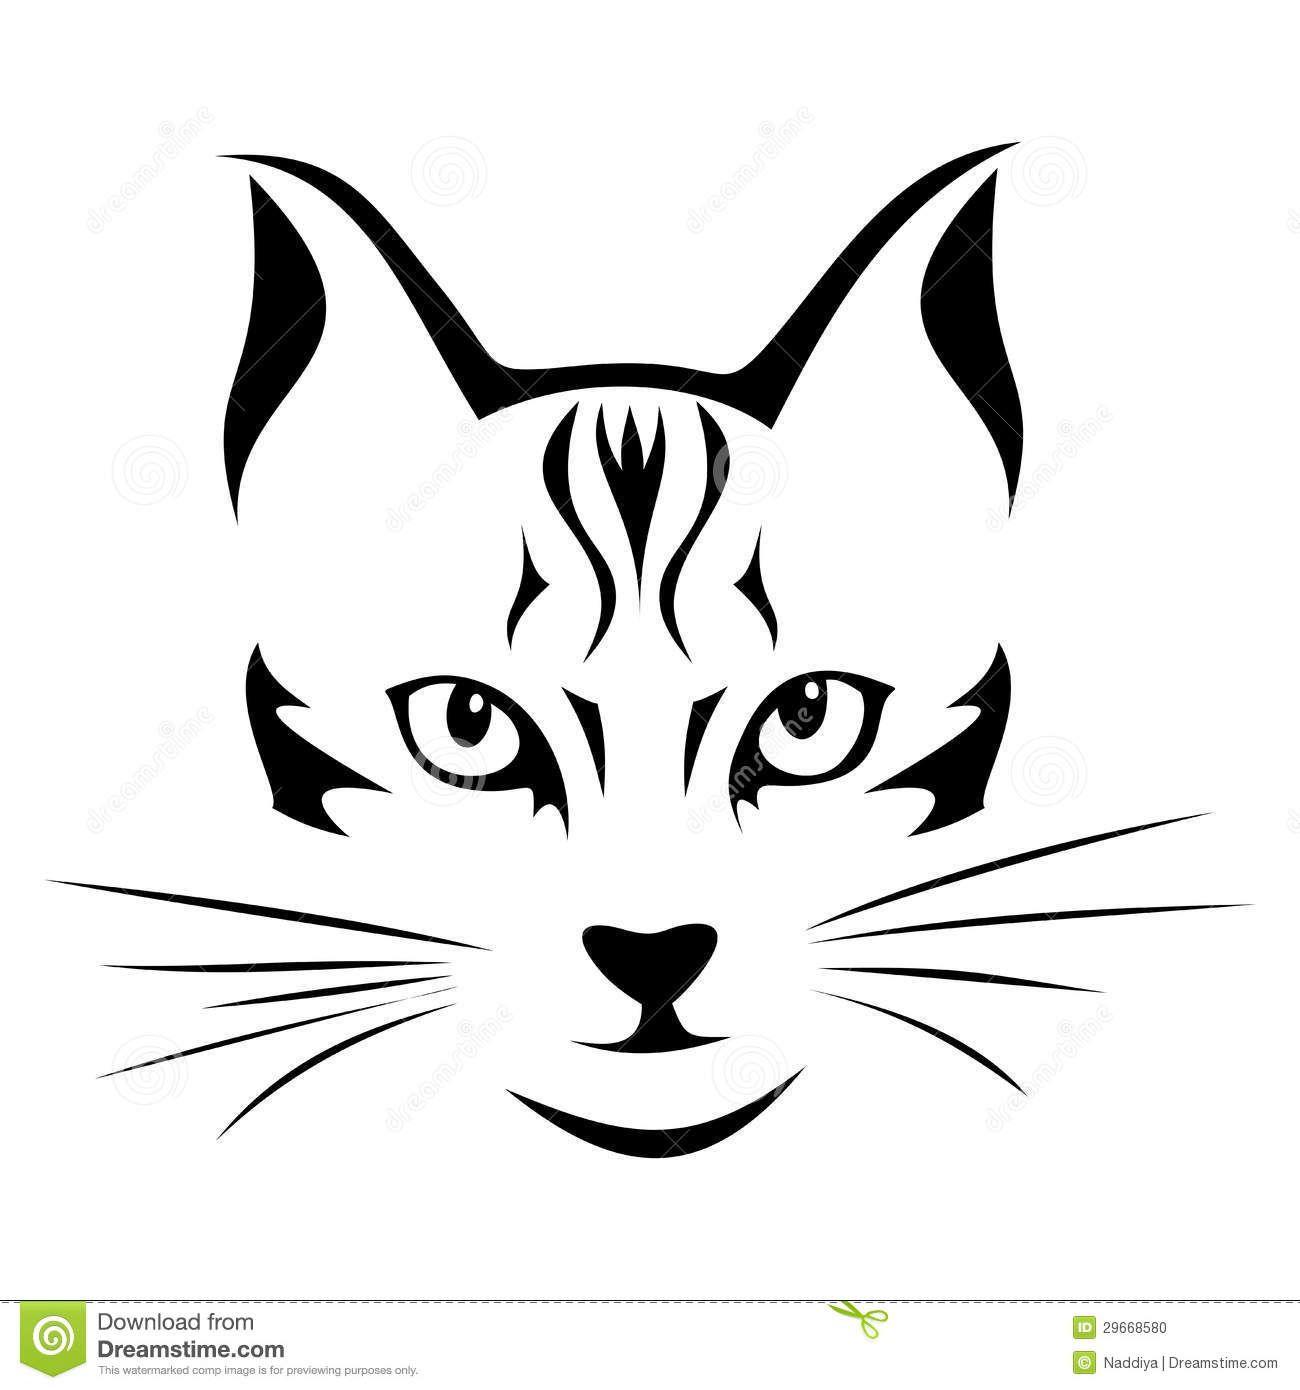 Ausmalbild Katzenkopf   Kinder Ausmalbilder